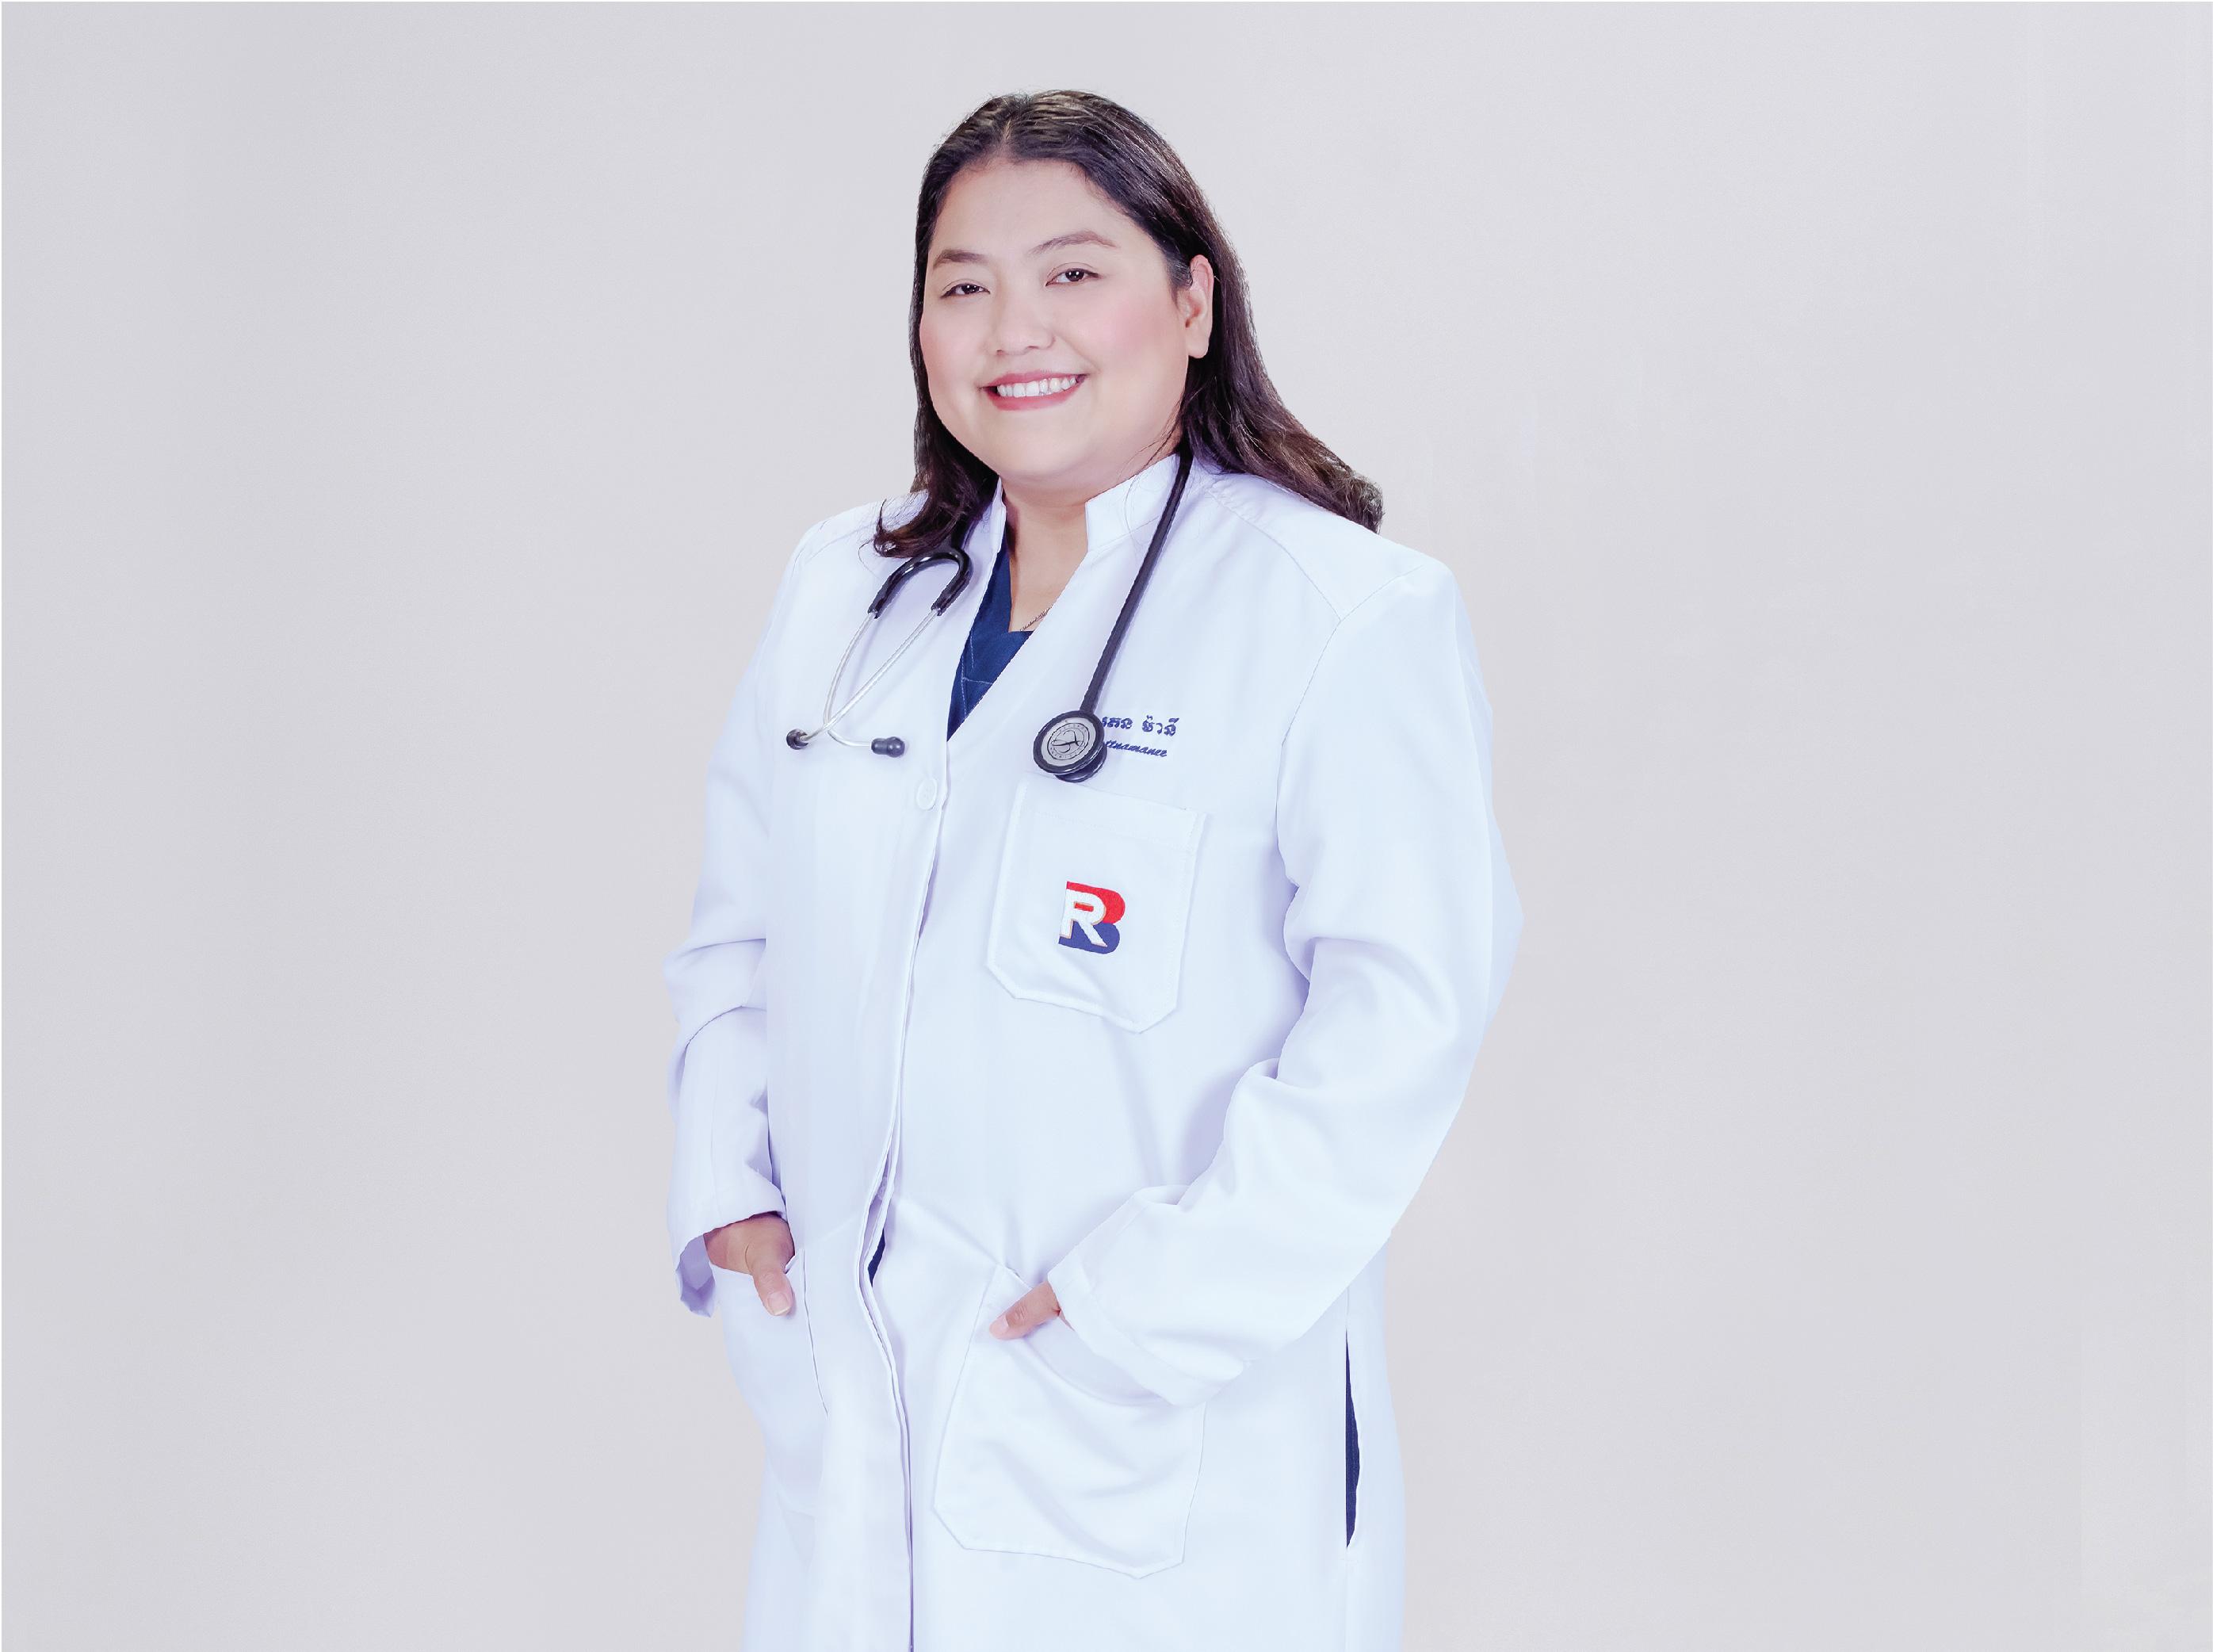 Dr. Rattanamanee Maneechote (TH)